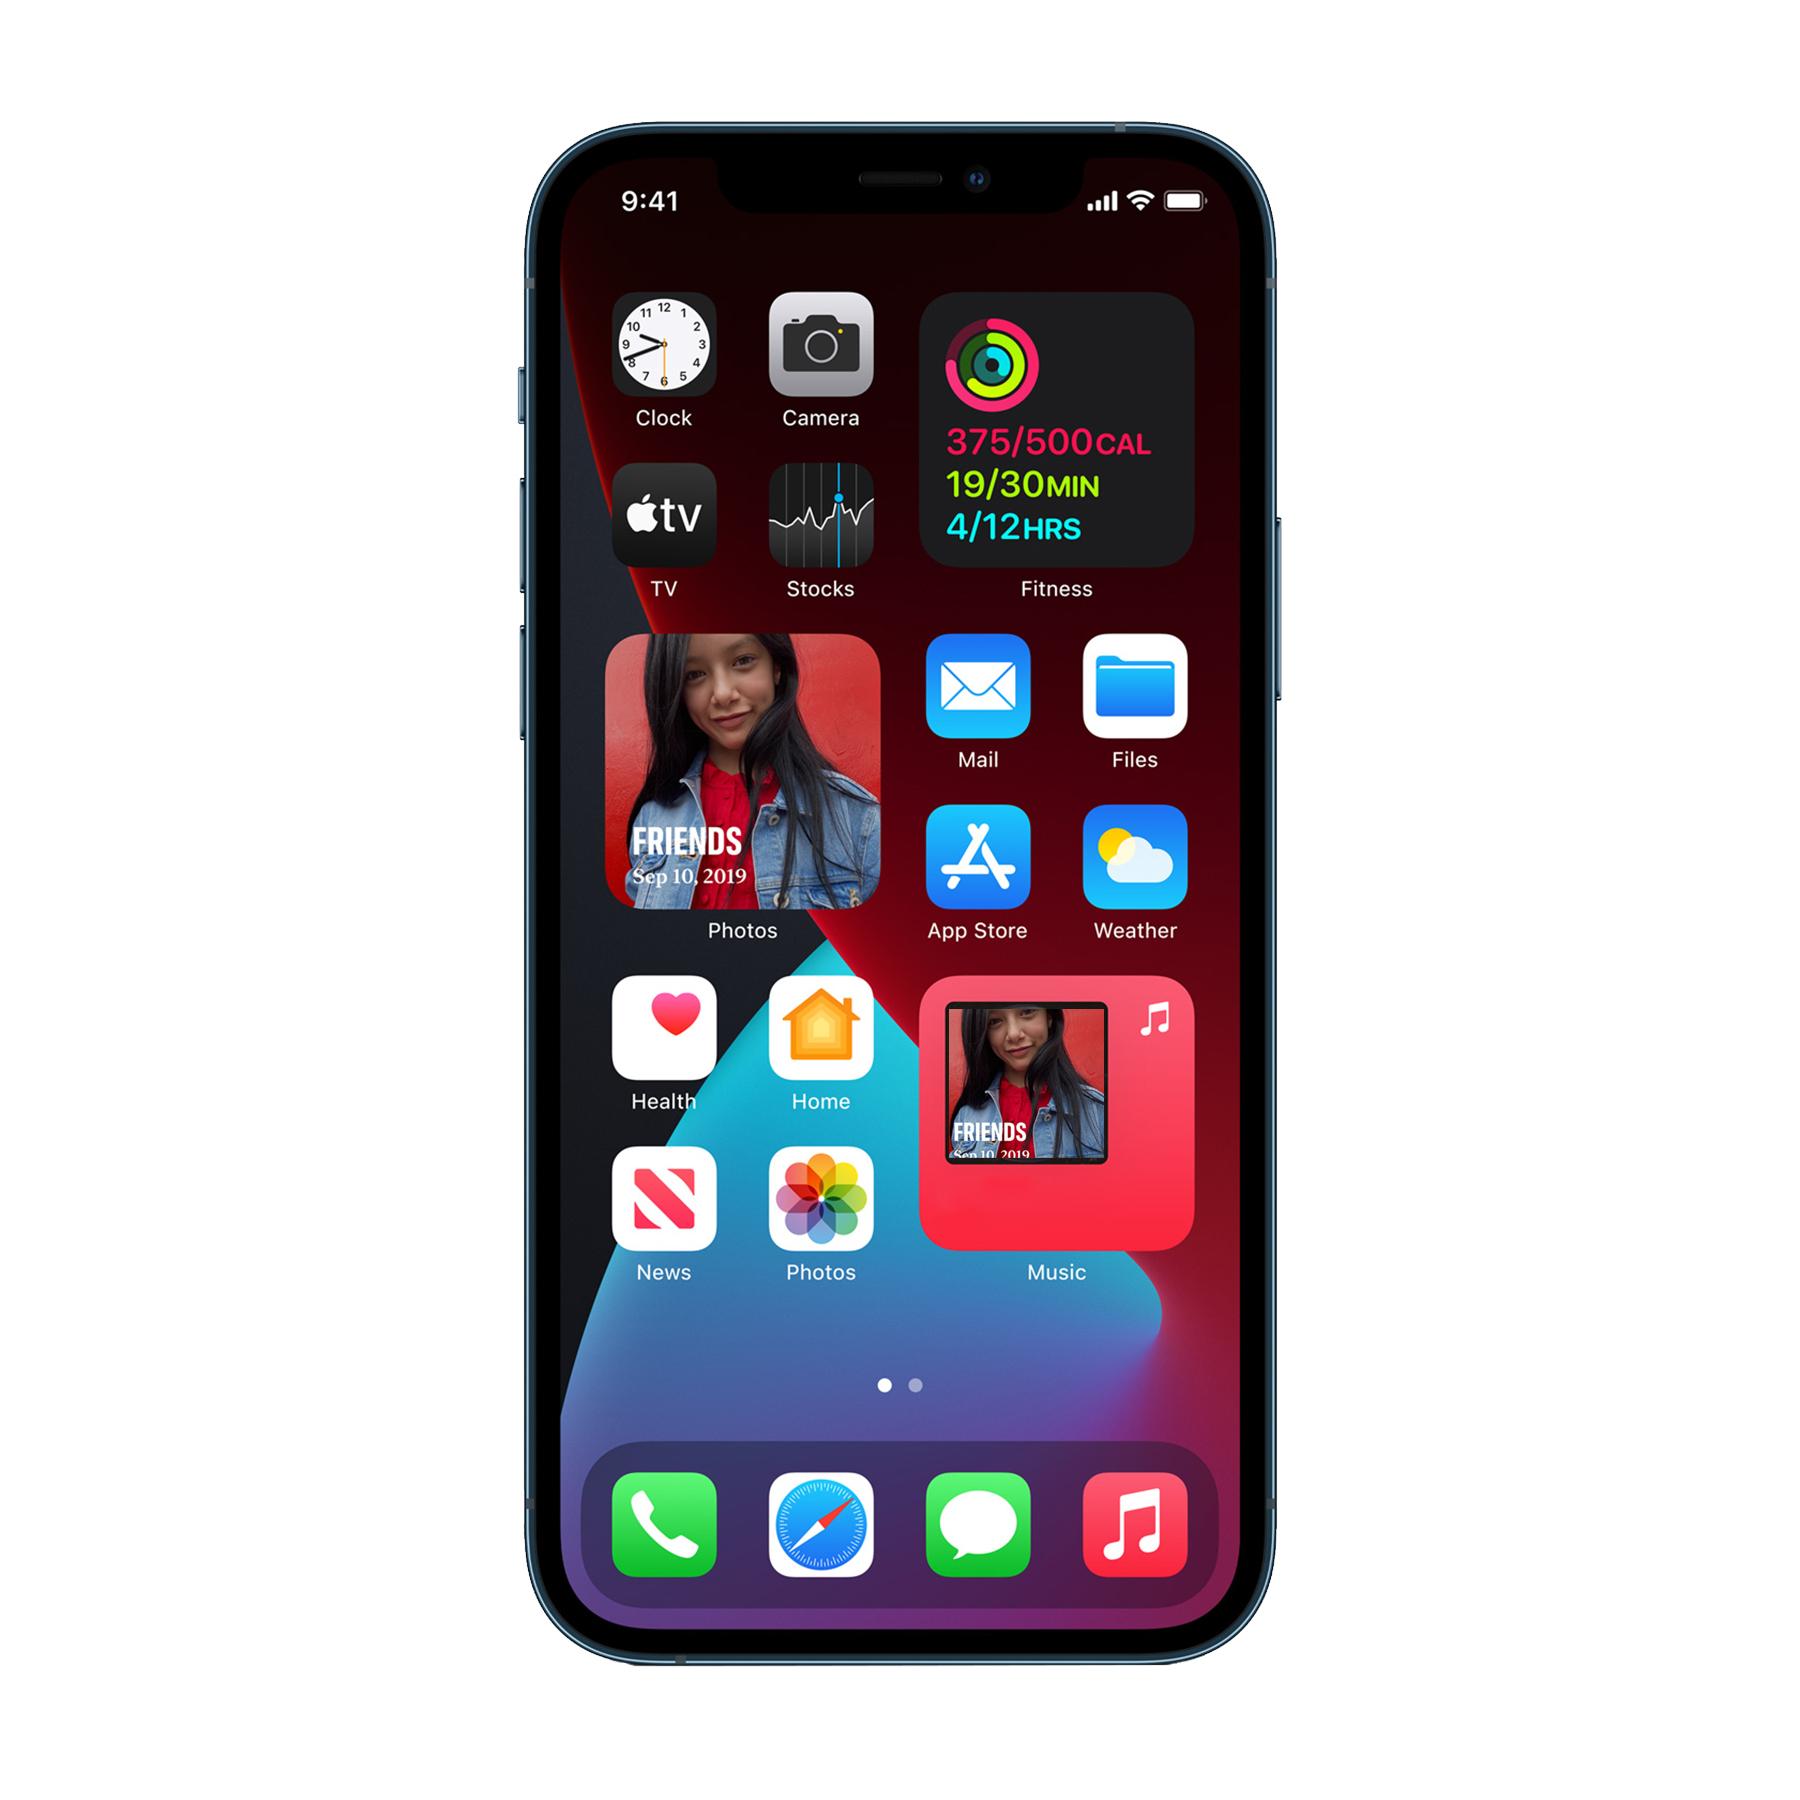 گوشی موبایل اپل مدل iPhone 12 Pro iPhone 12 Pro mgl93za/a دو سیم کارت ظرفیت 128 گیگابایت